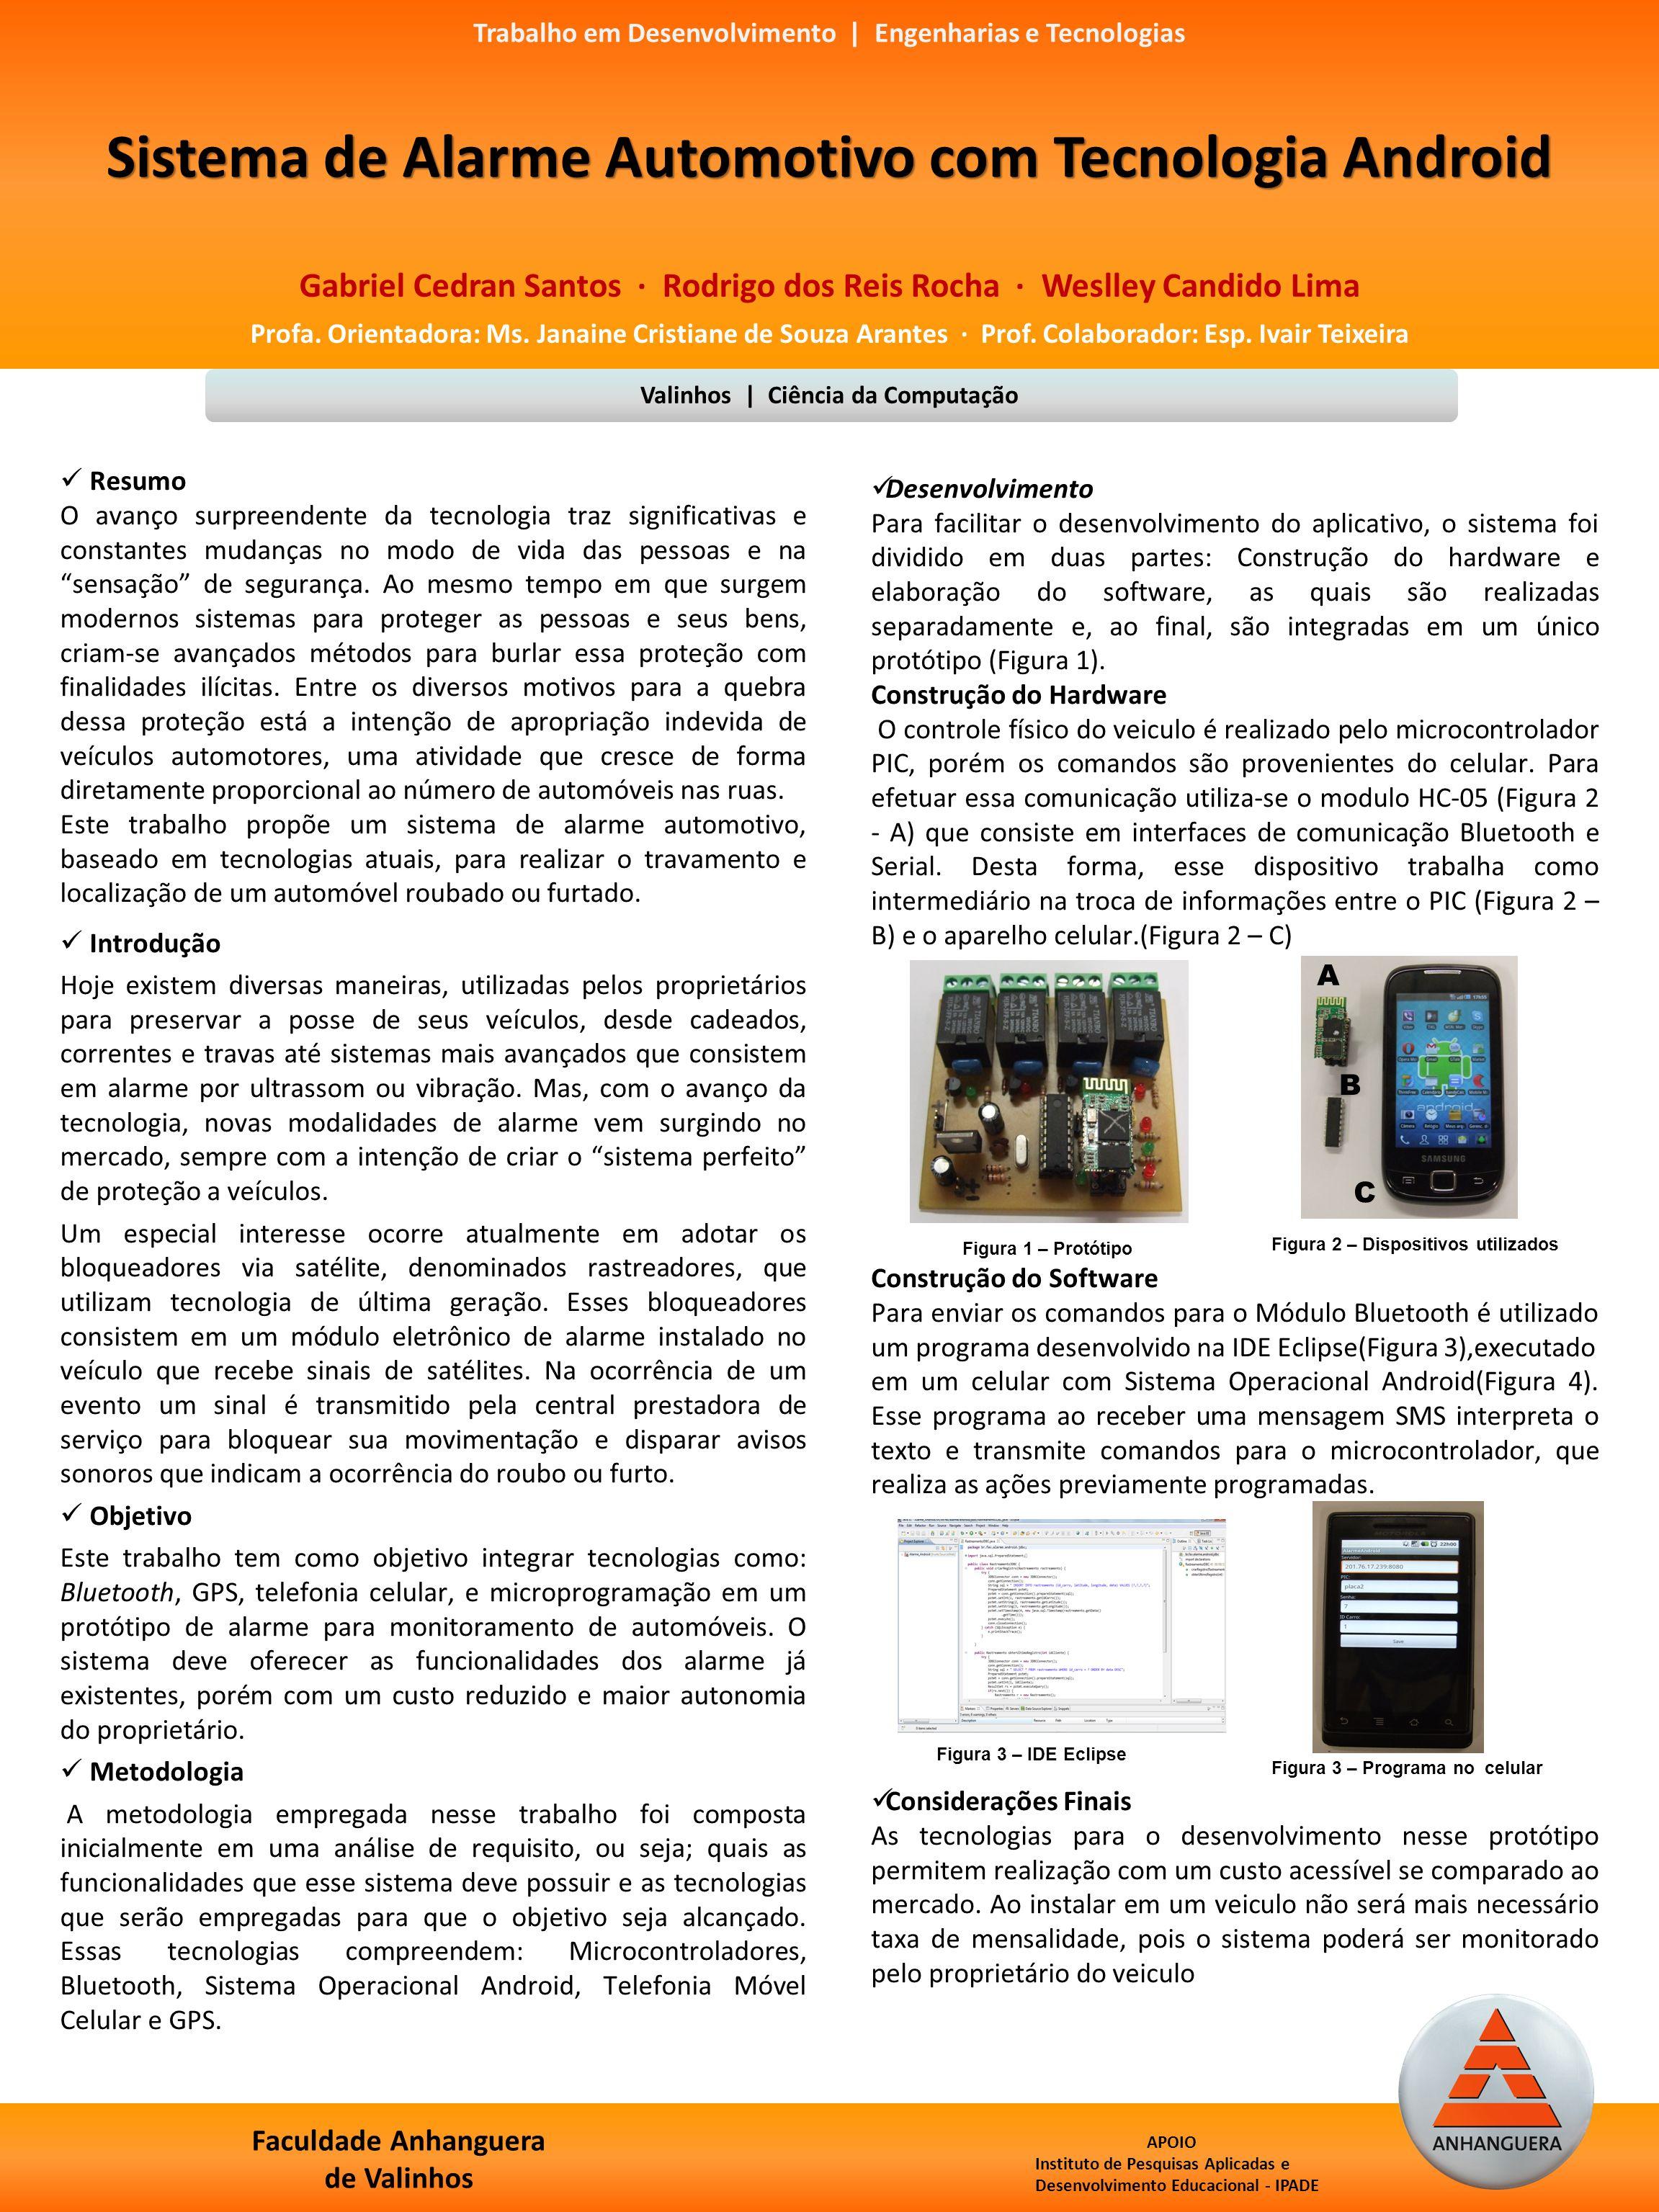 Sistema de Alarme Automotivo com Tecnologia Android